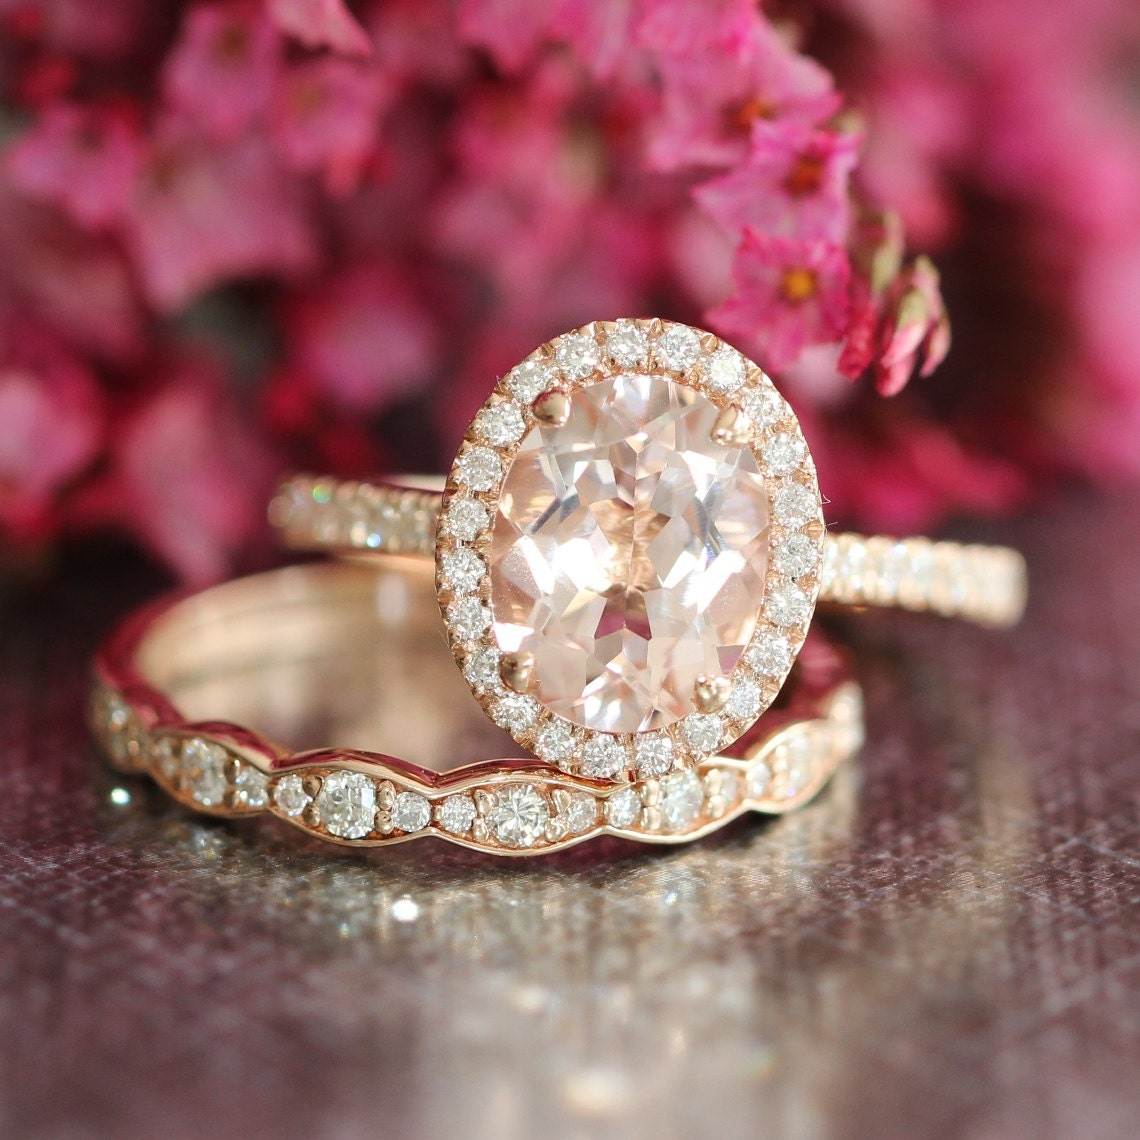 rose gold morganite wedding ring set halo diamond engagement. Black Bedroom Furniture Sets. Home Design Ideas